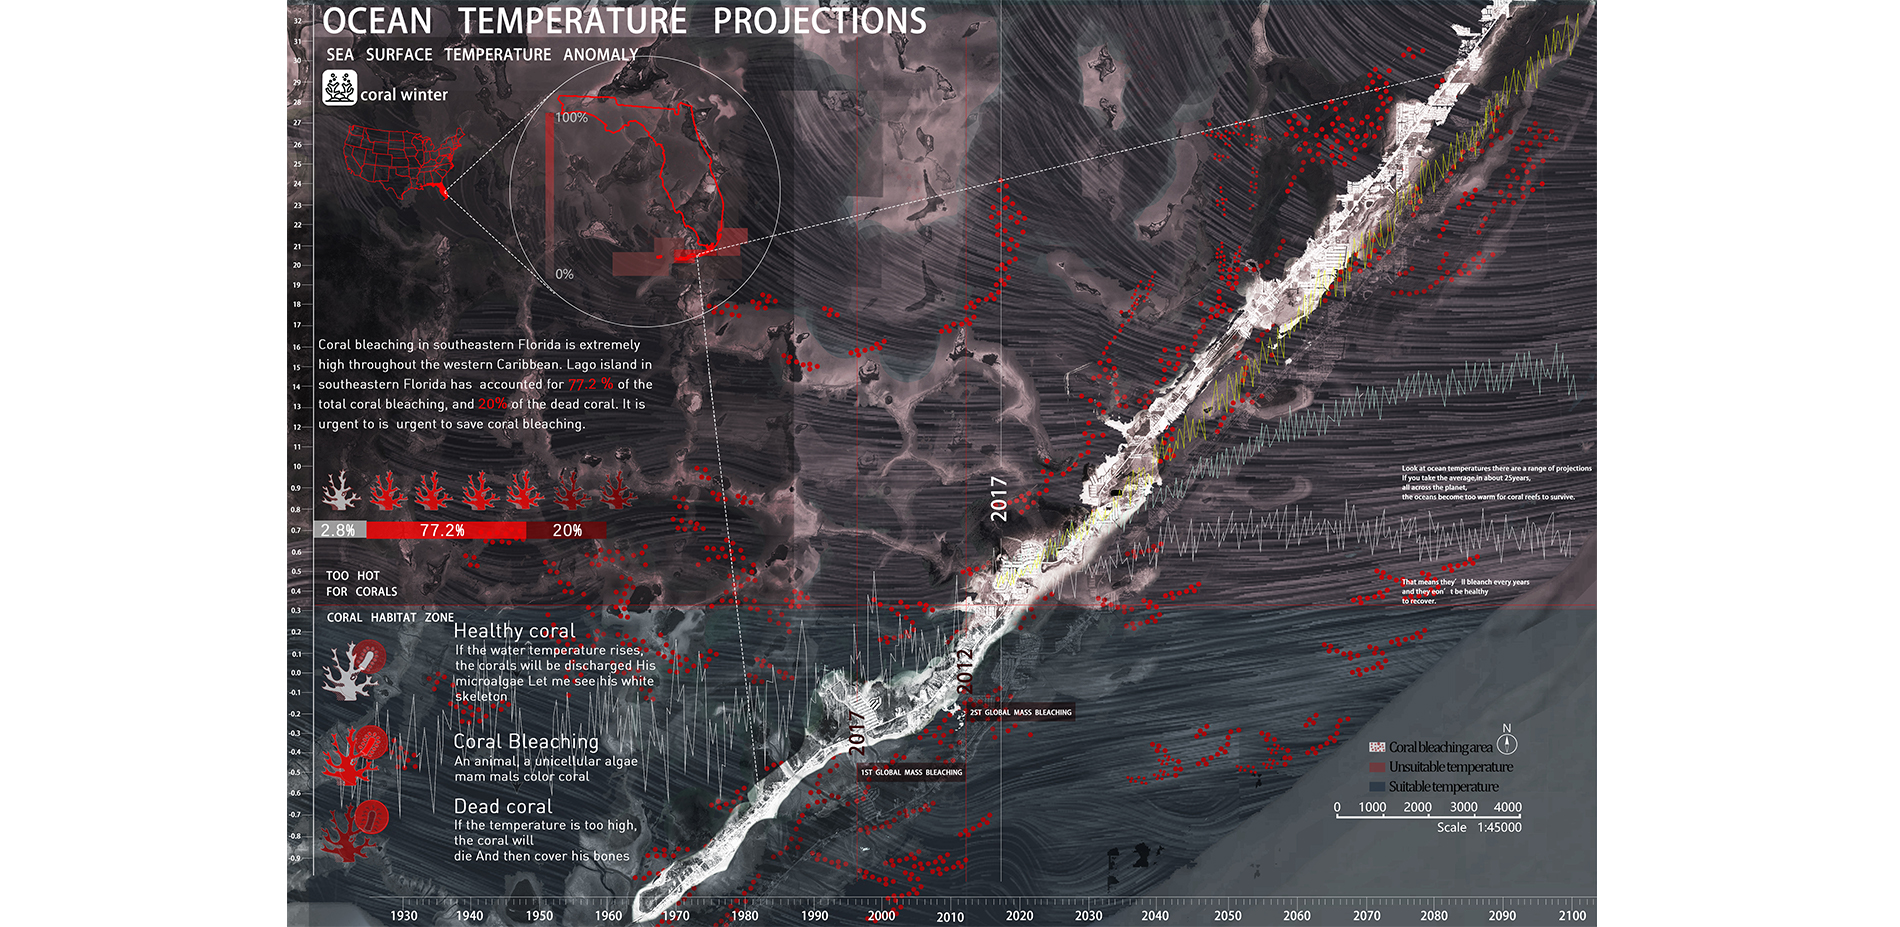 REGION OVERVIEW. OCEAN TEMPERATURE PROJECTIONS